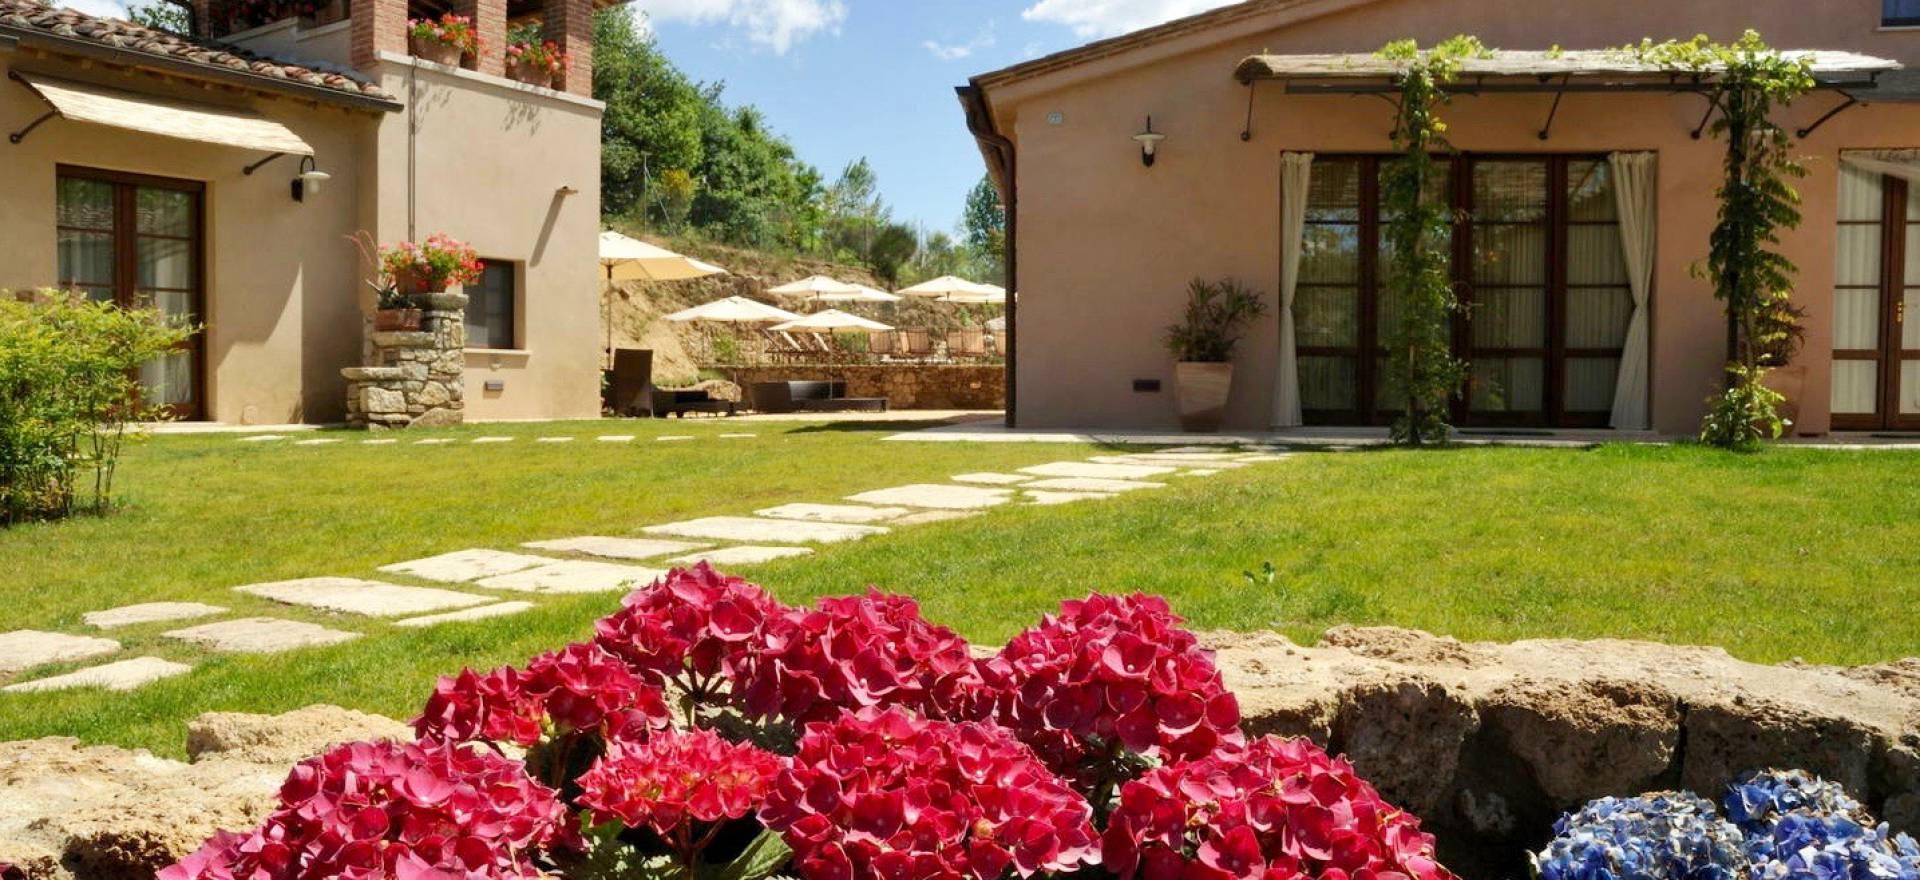 Agriturismo Toscana Agriturismo di lusso tra Siena e Arezzo in Toscana